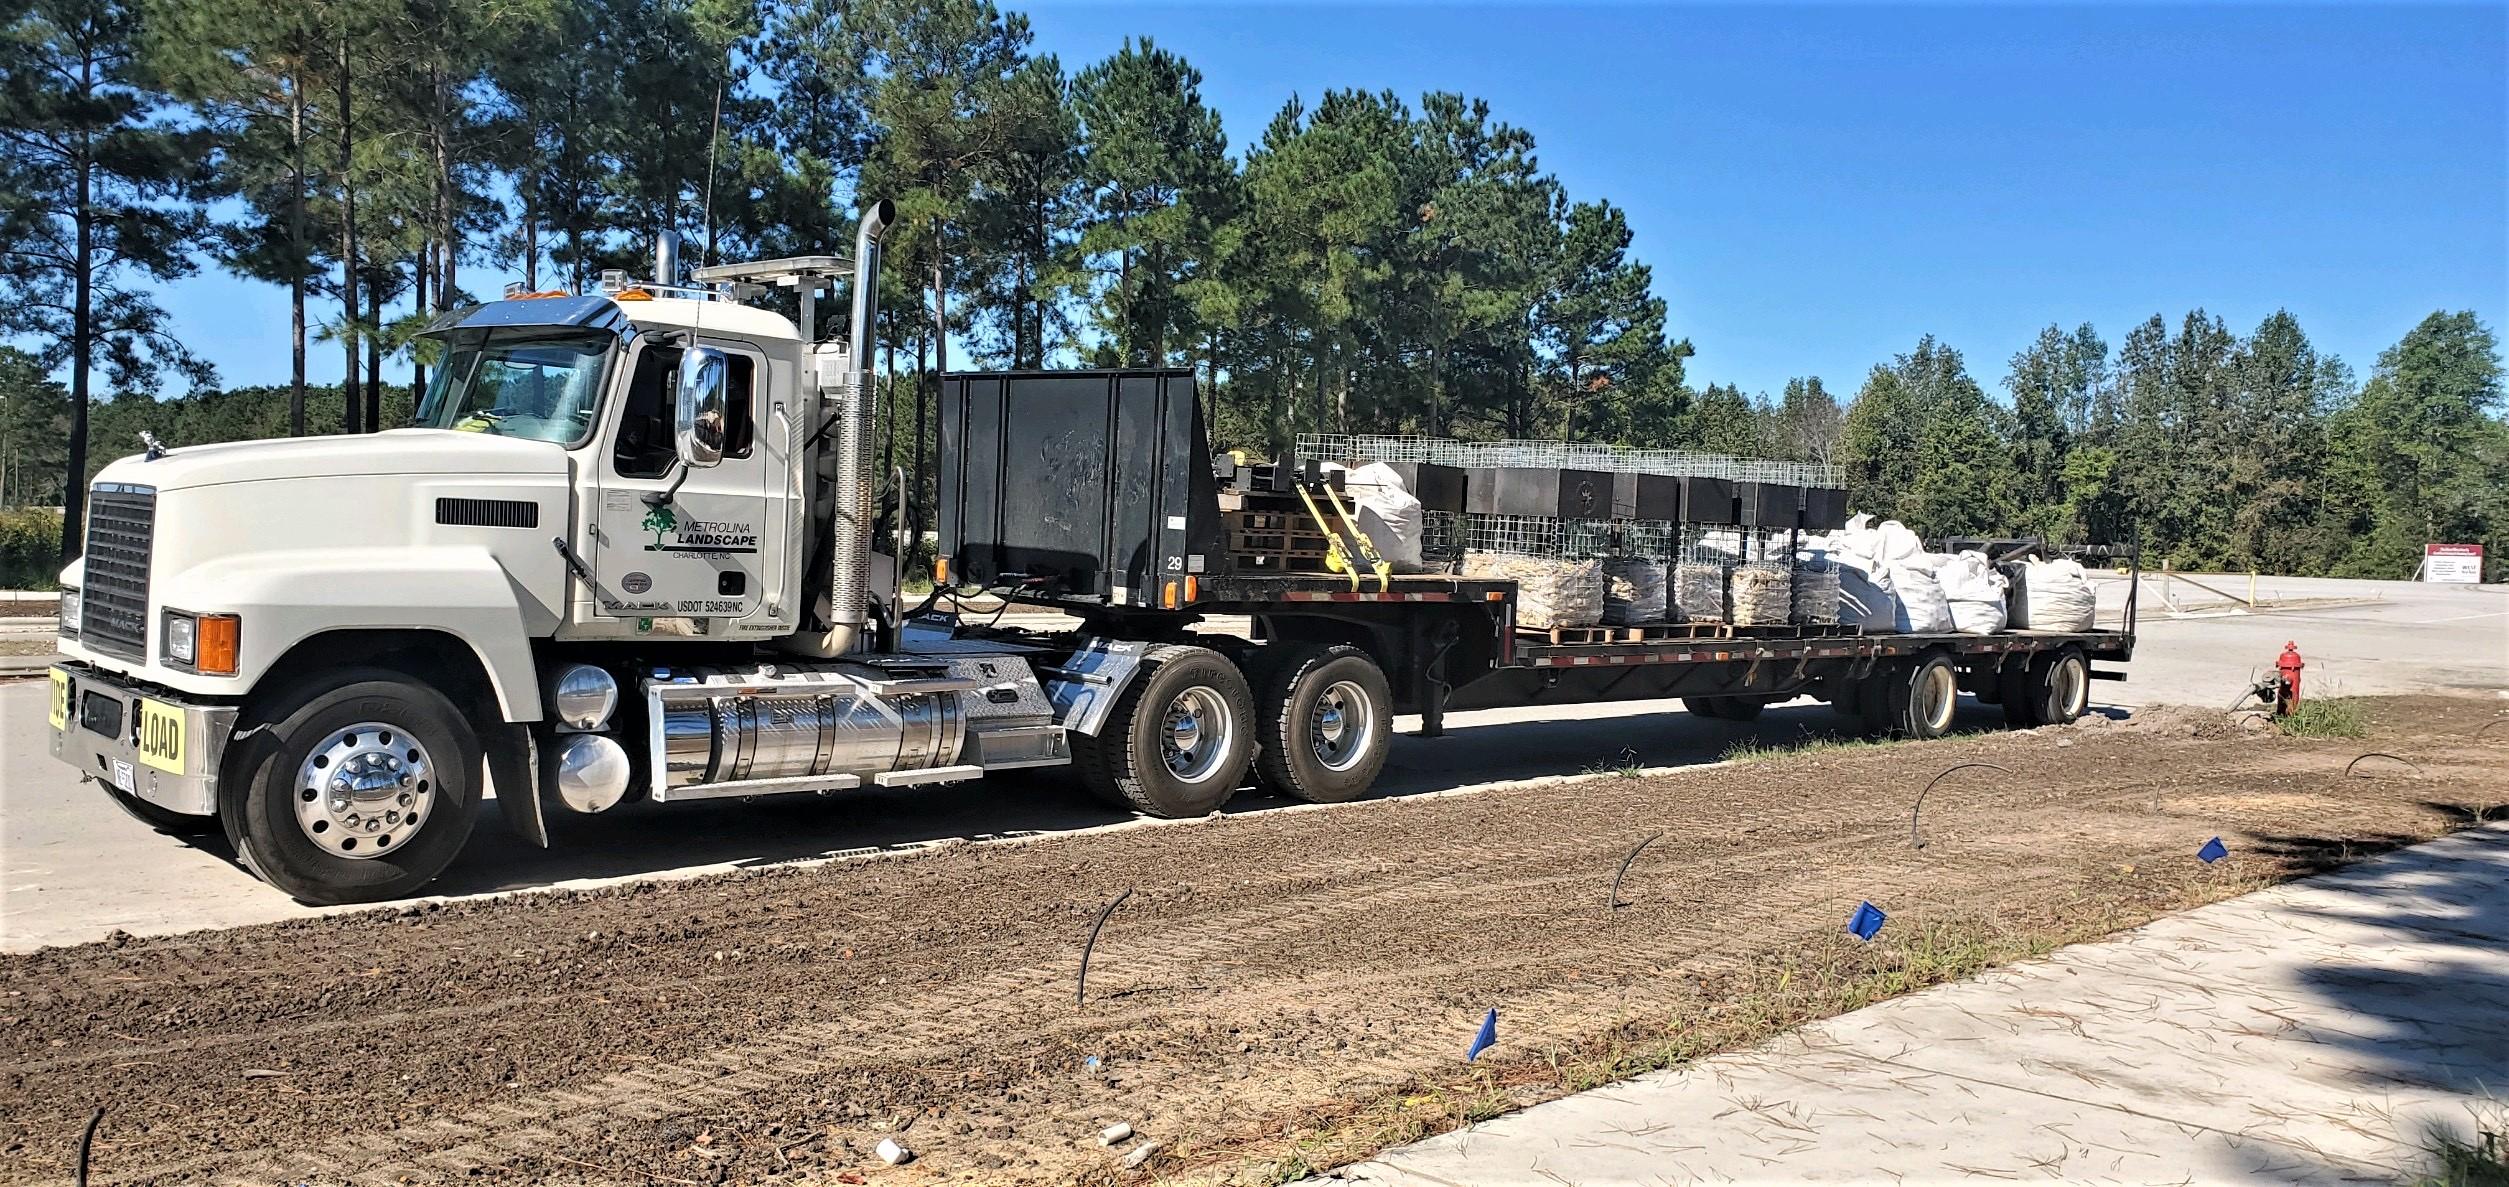 Truck- West New Bern